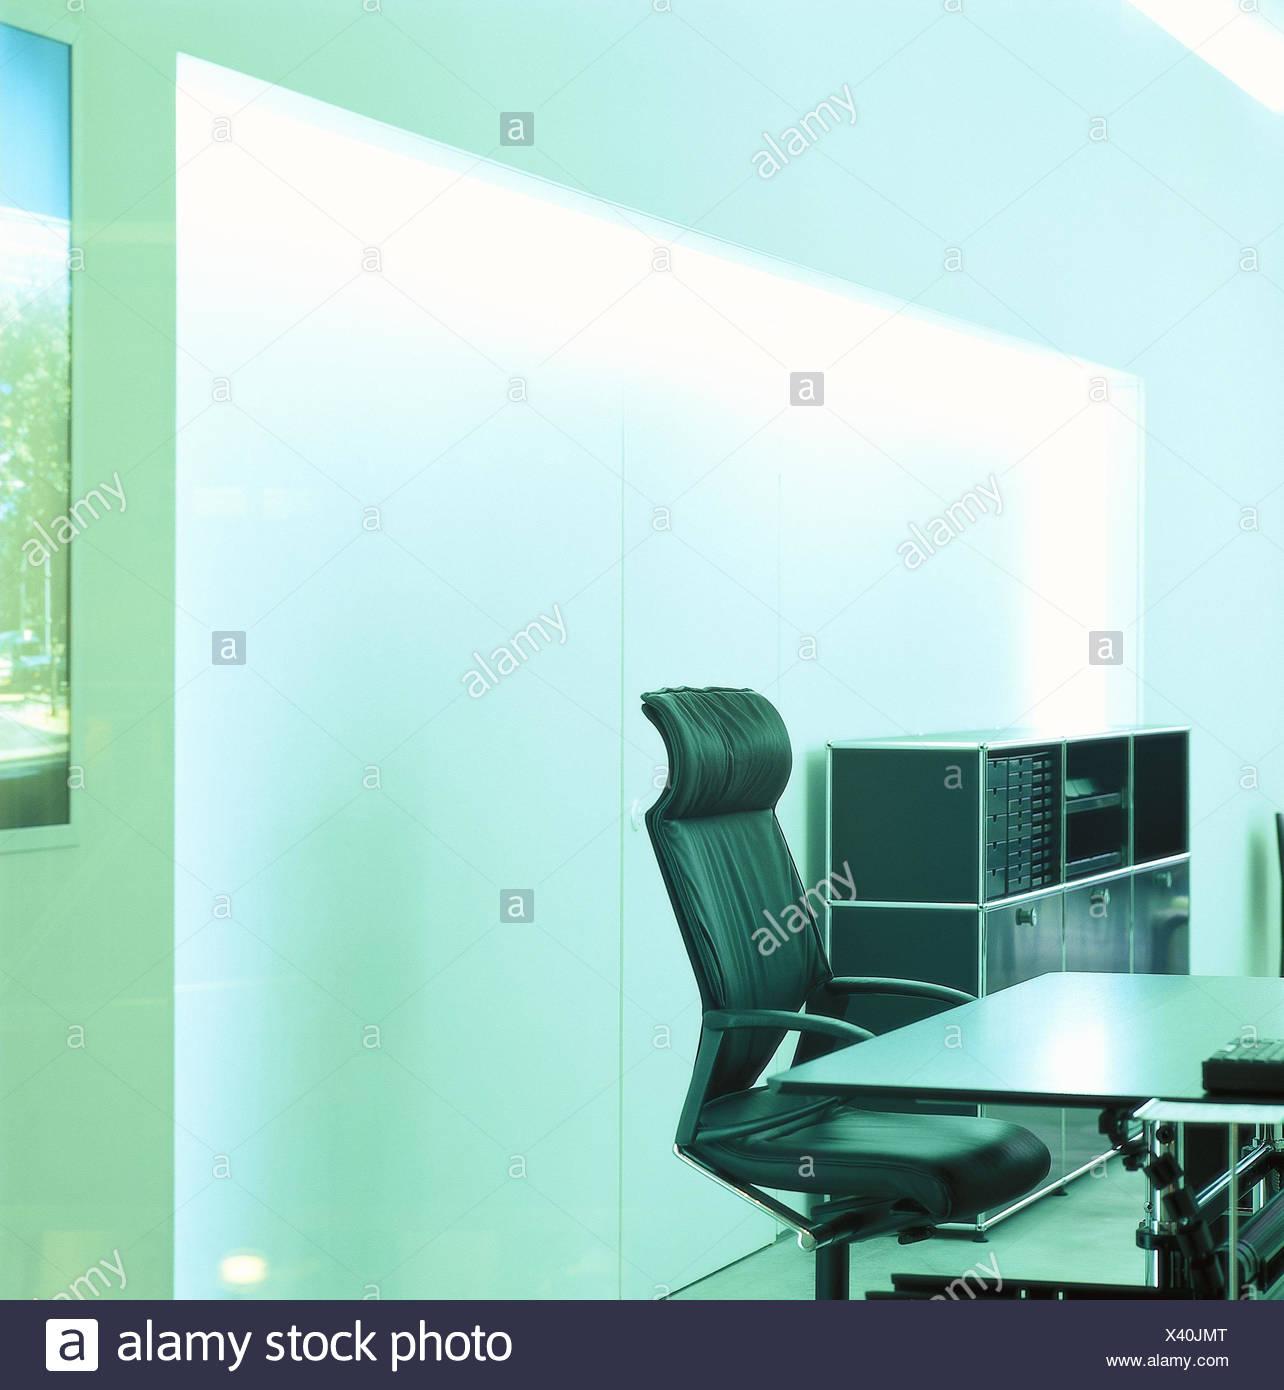 Office furnitures, modern, armchair, desk, swivelling, inside, office, office equipment, cupboard, office armchair, leather ball armchair, St. furniture, spectral filter, green - Stock Image